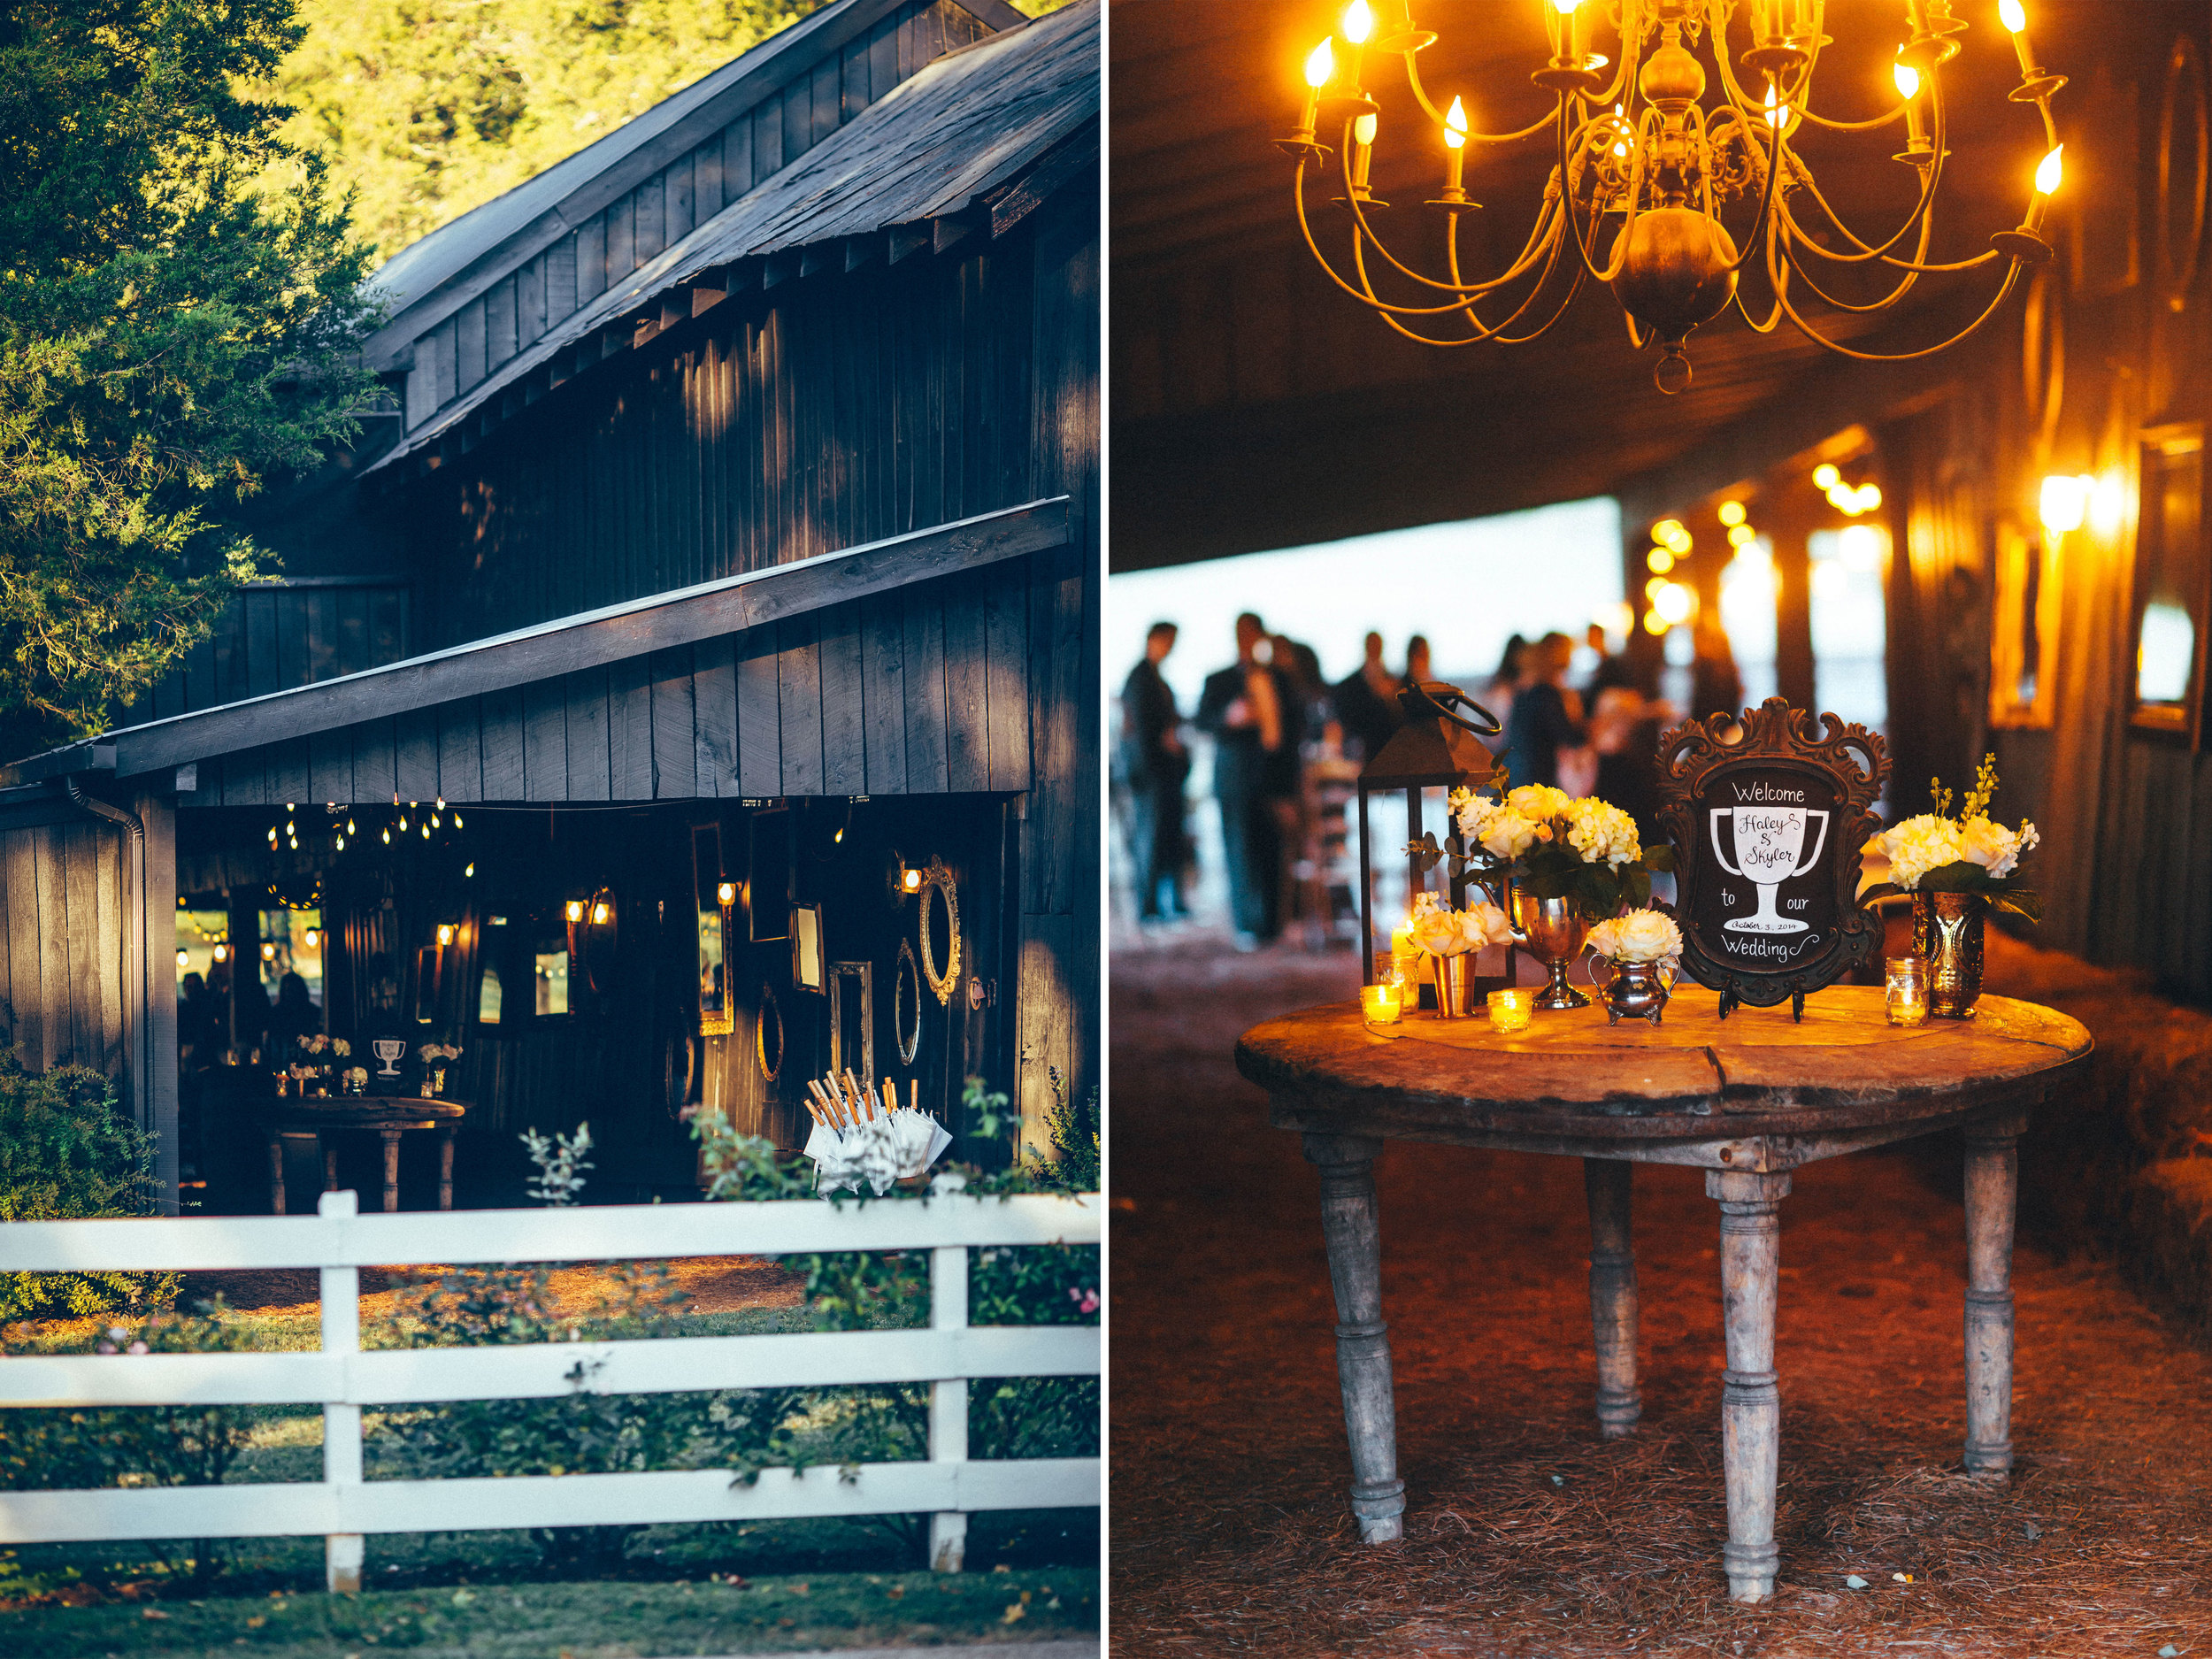 Me & Mr. Jones Wedding, Cocktail Hour in the Barn, Black Tie Wedding, Rustic Glam Wedding